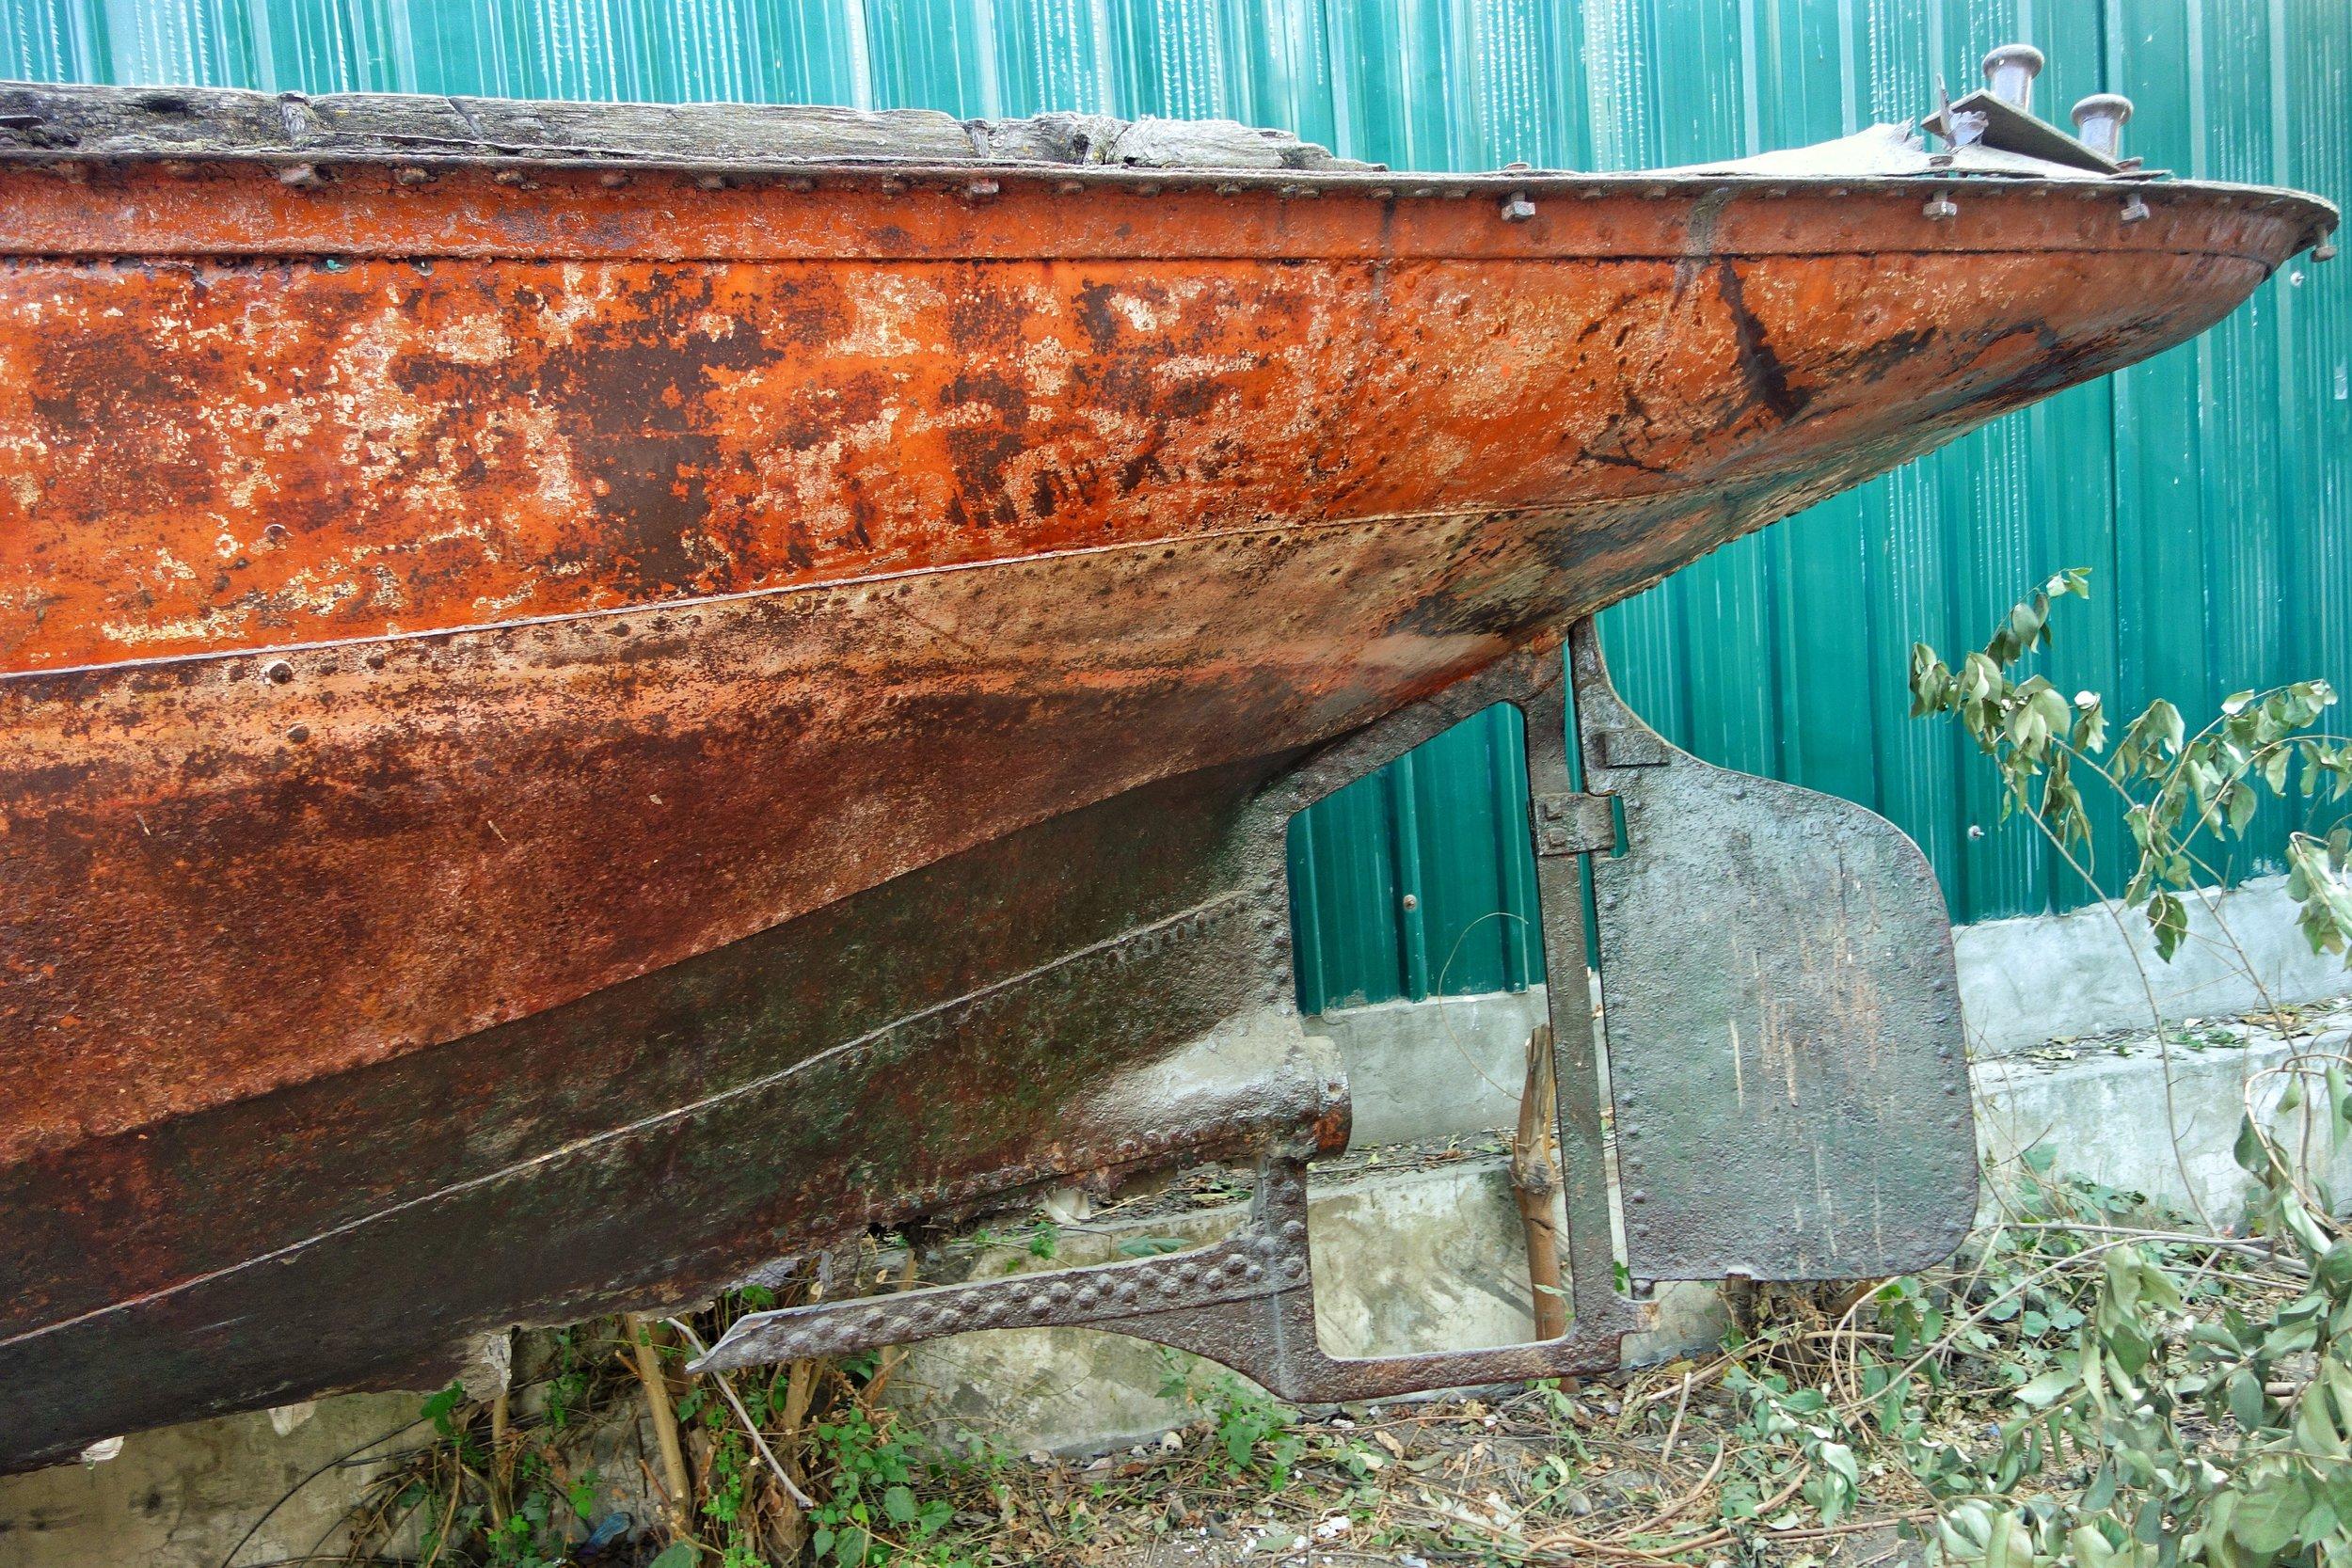 queenvictoria-ranbirsingh-boat-spsmuseum-srinagar